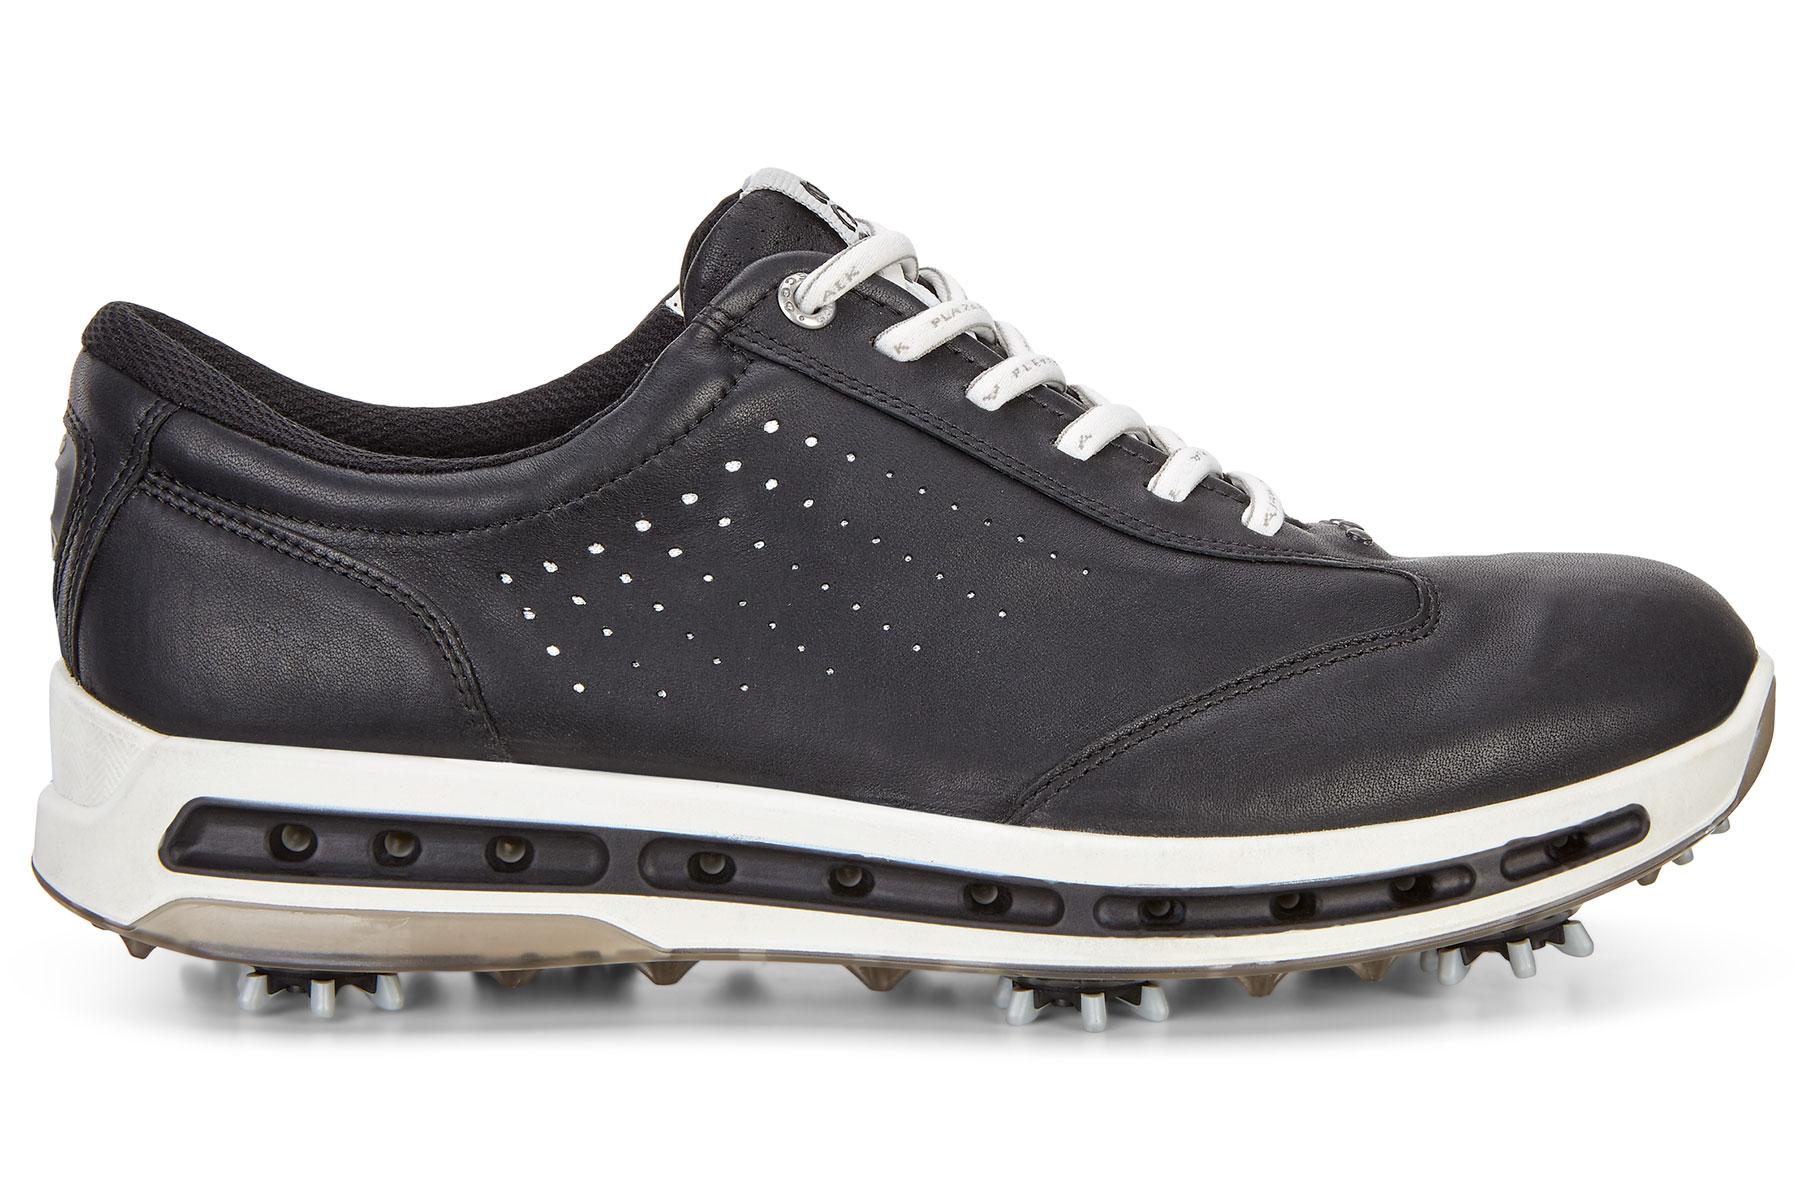 American Golf Ecco Cool Golf Shoes